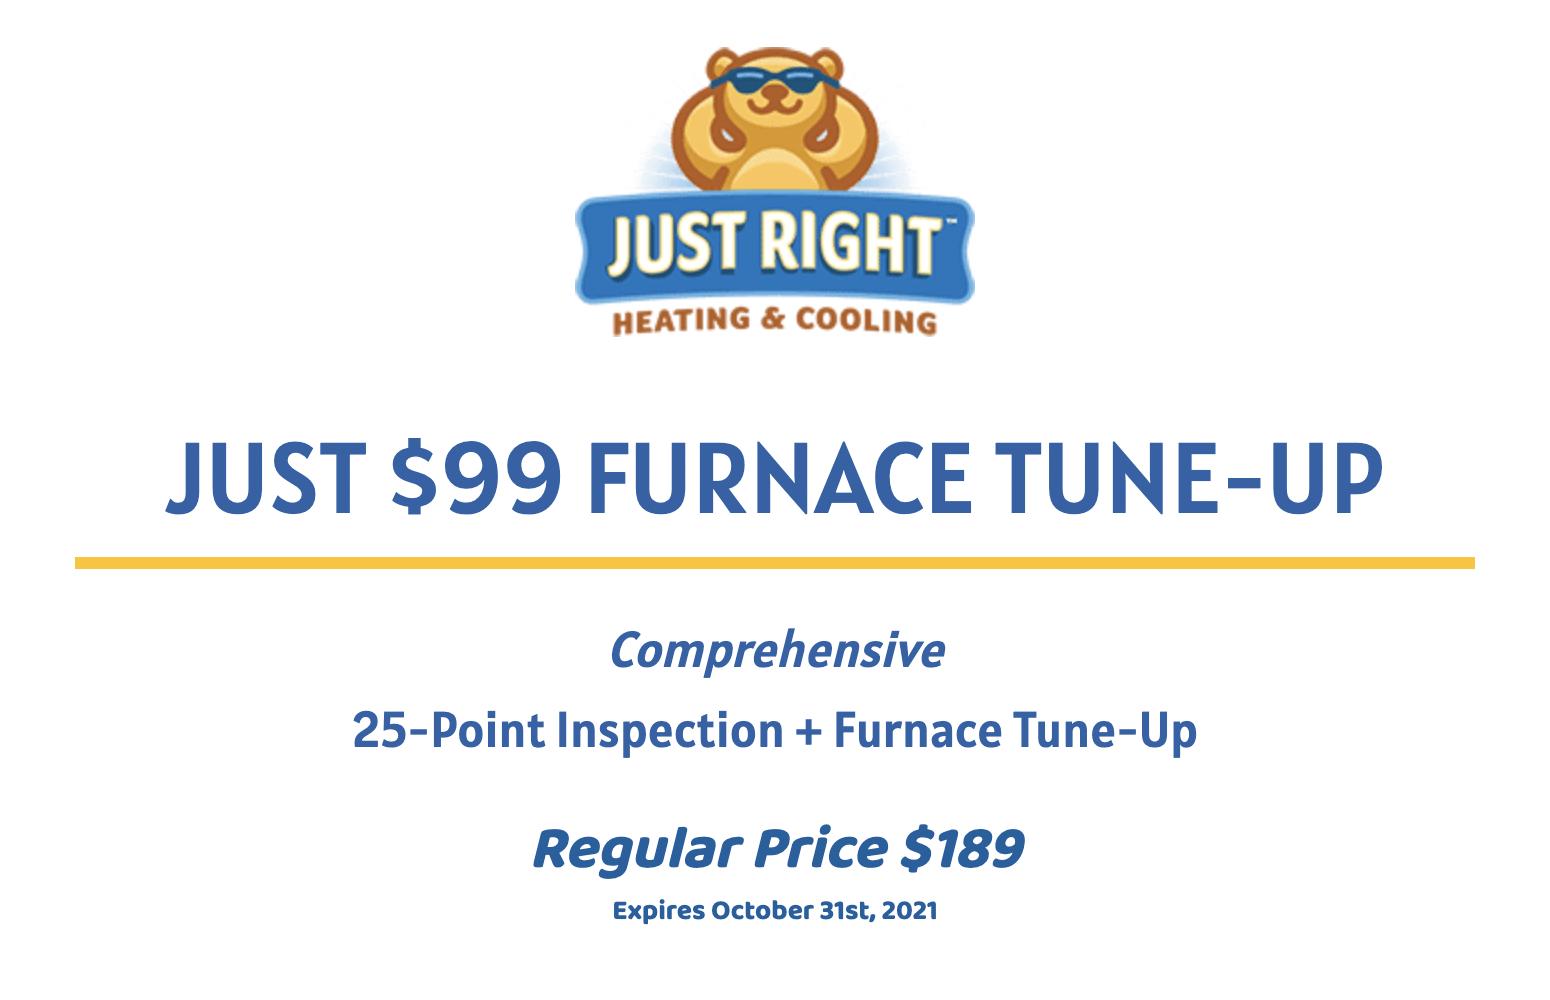 99 furnace tune up coupon.